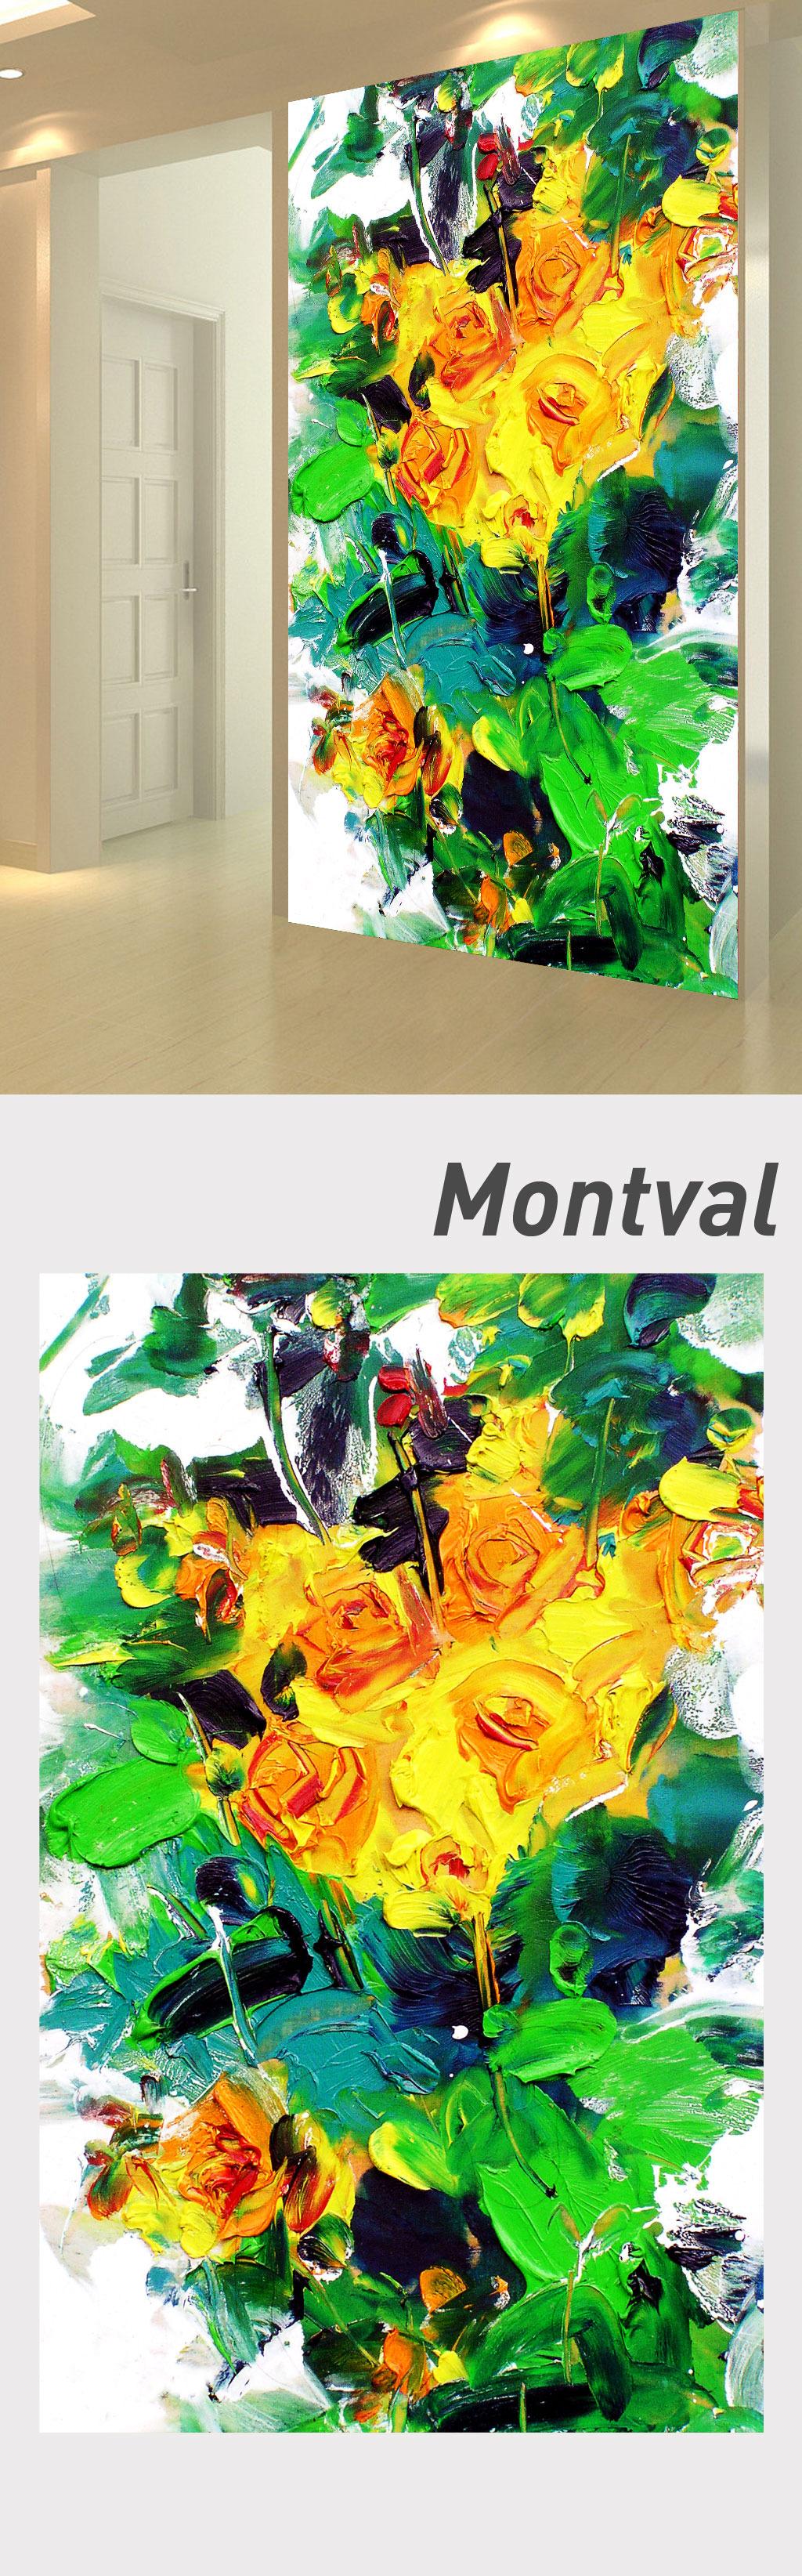 3d立体手绘油画花束玄关门厅背景墙设计